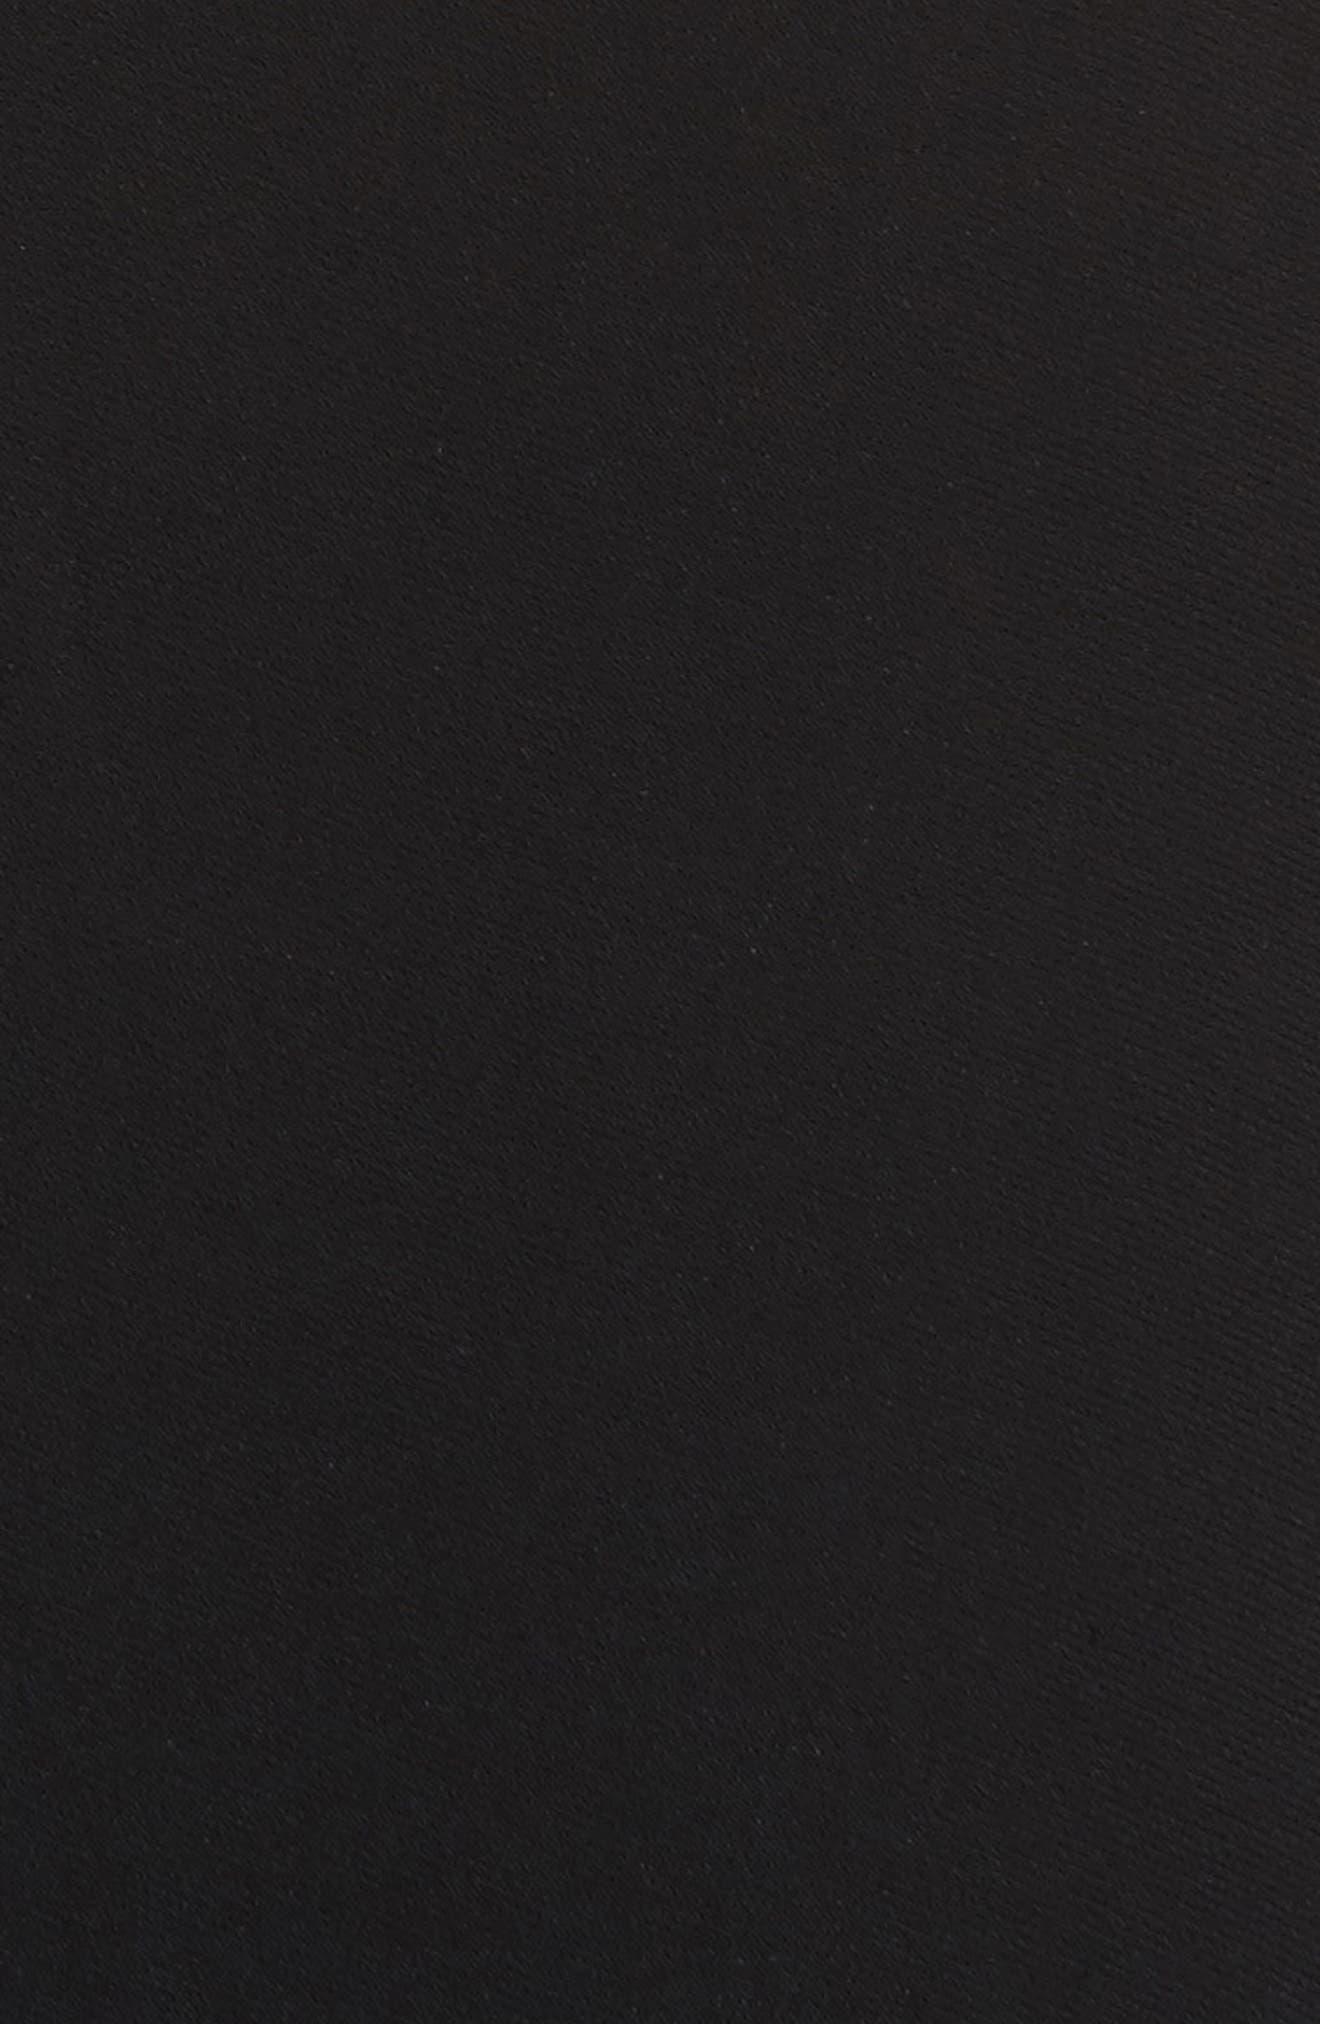 Miriam Sheath Dress,                             Alternate thumbnail 6, color,                             Black